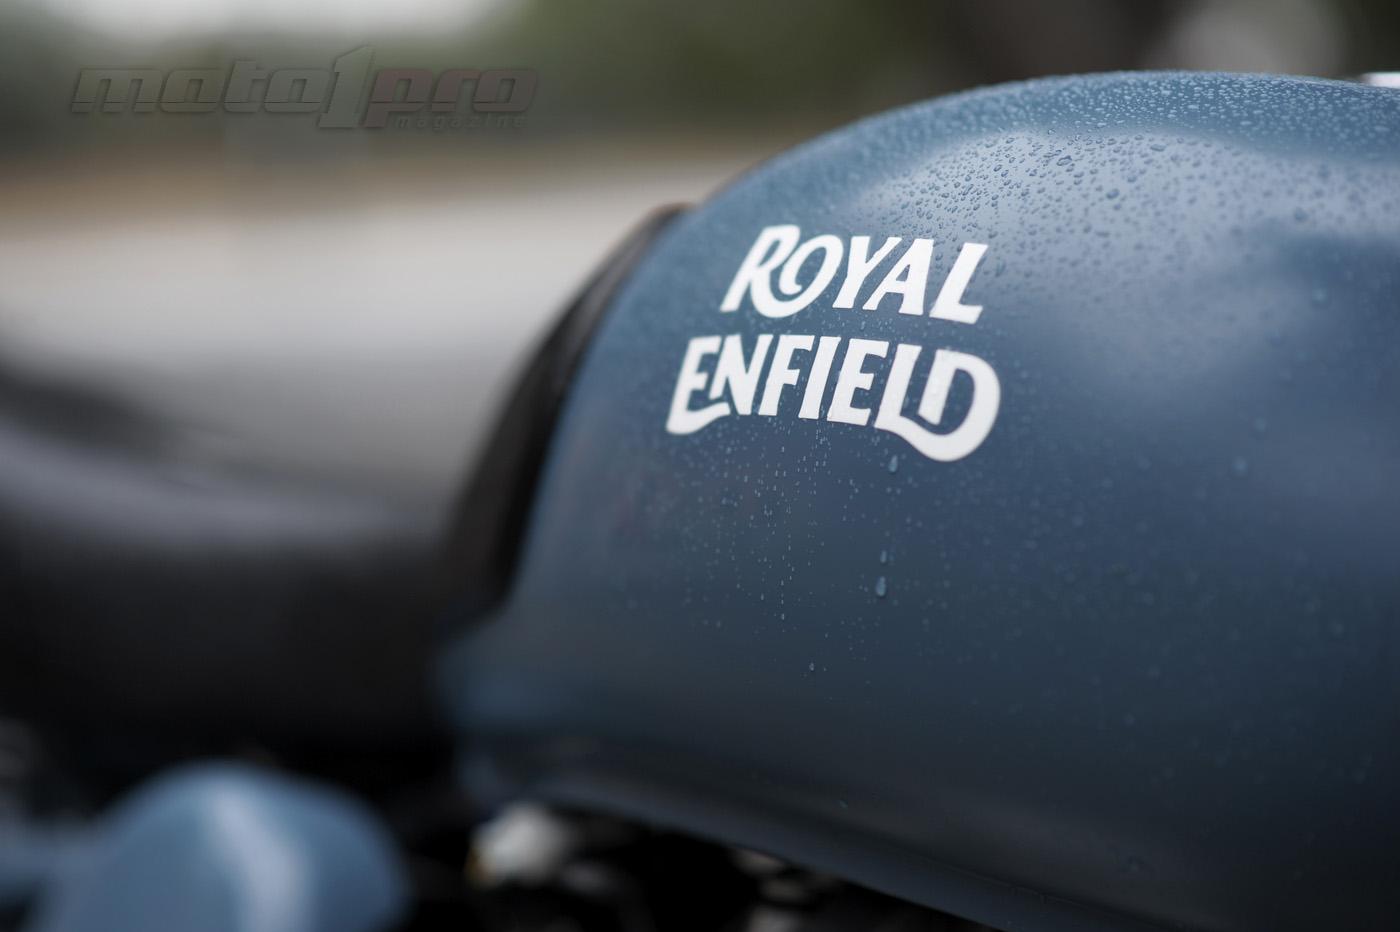 royal_enfield_squadron_e4_classic_500_deposito